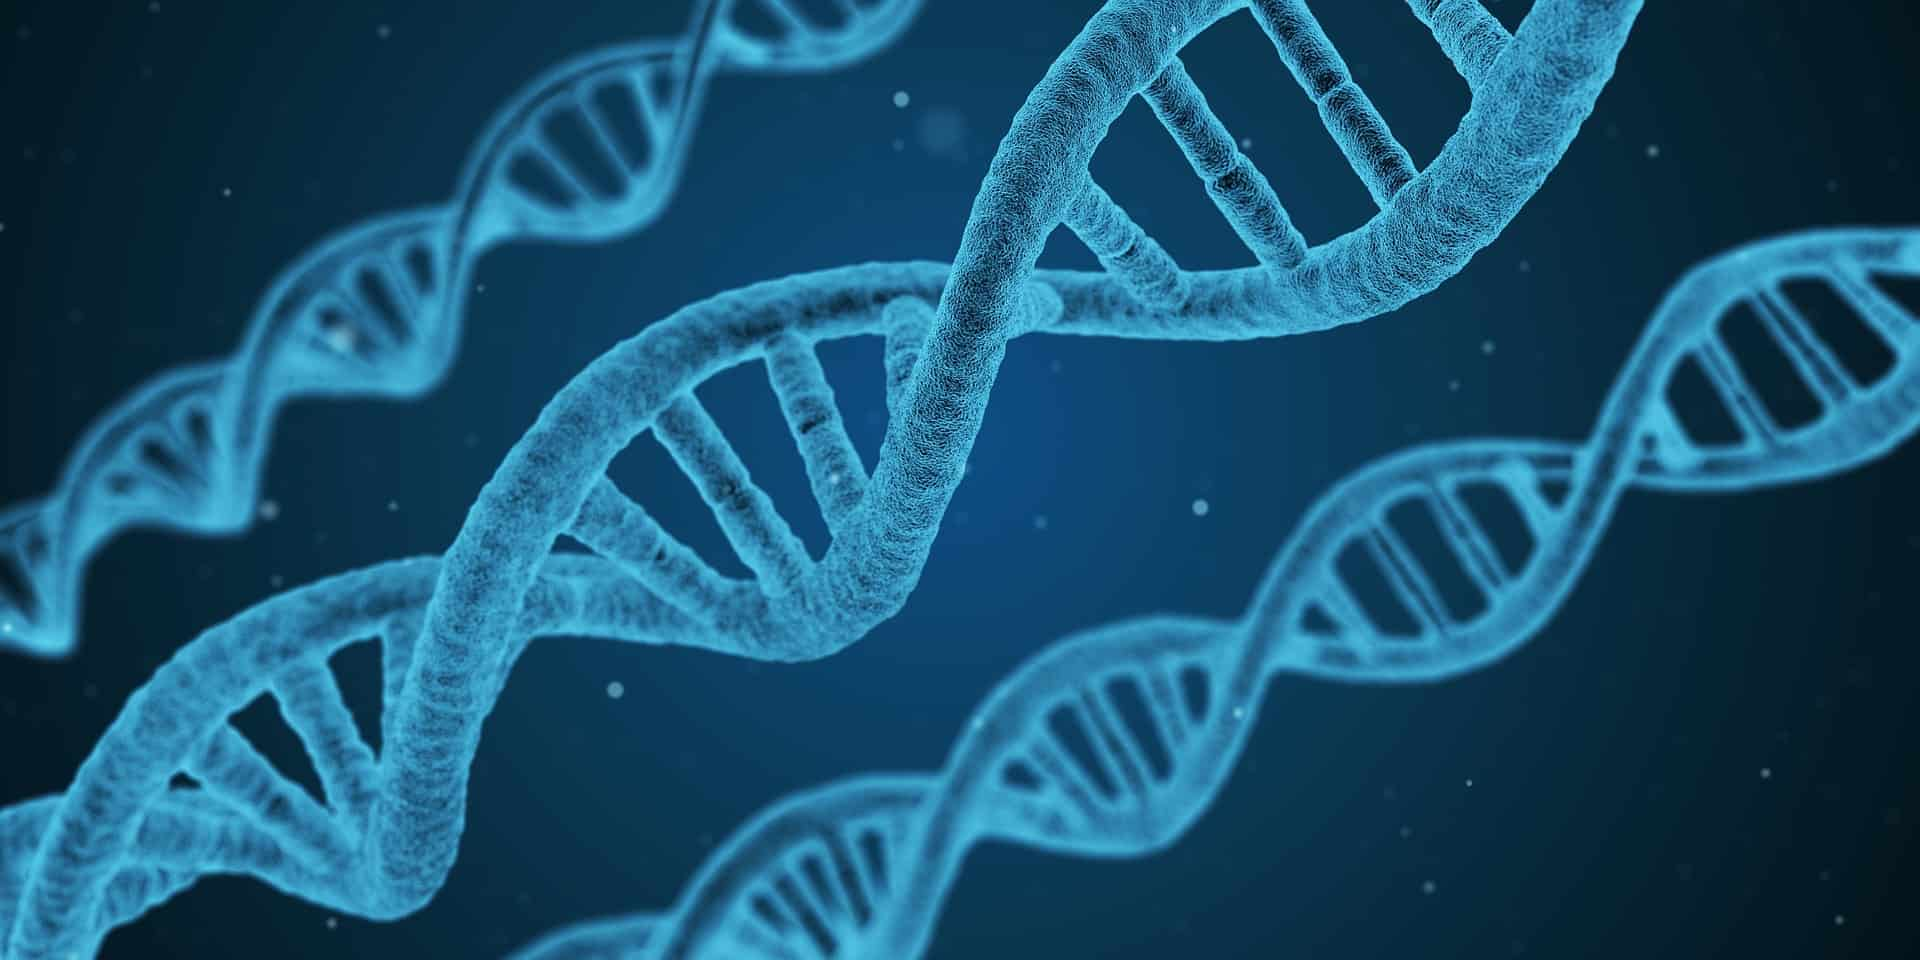 7 things to consider when choosing cannabis genetics